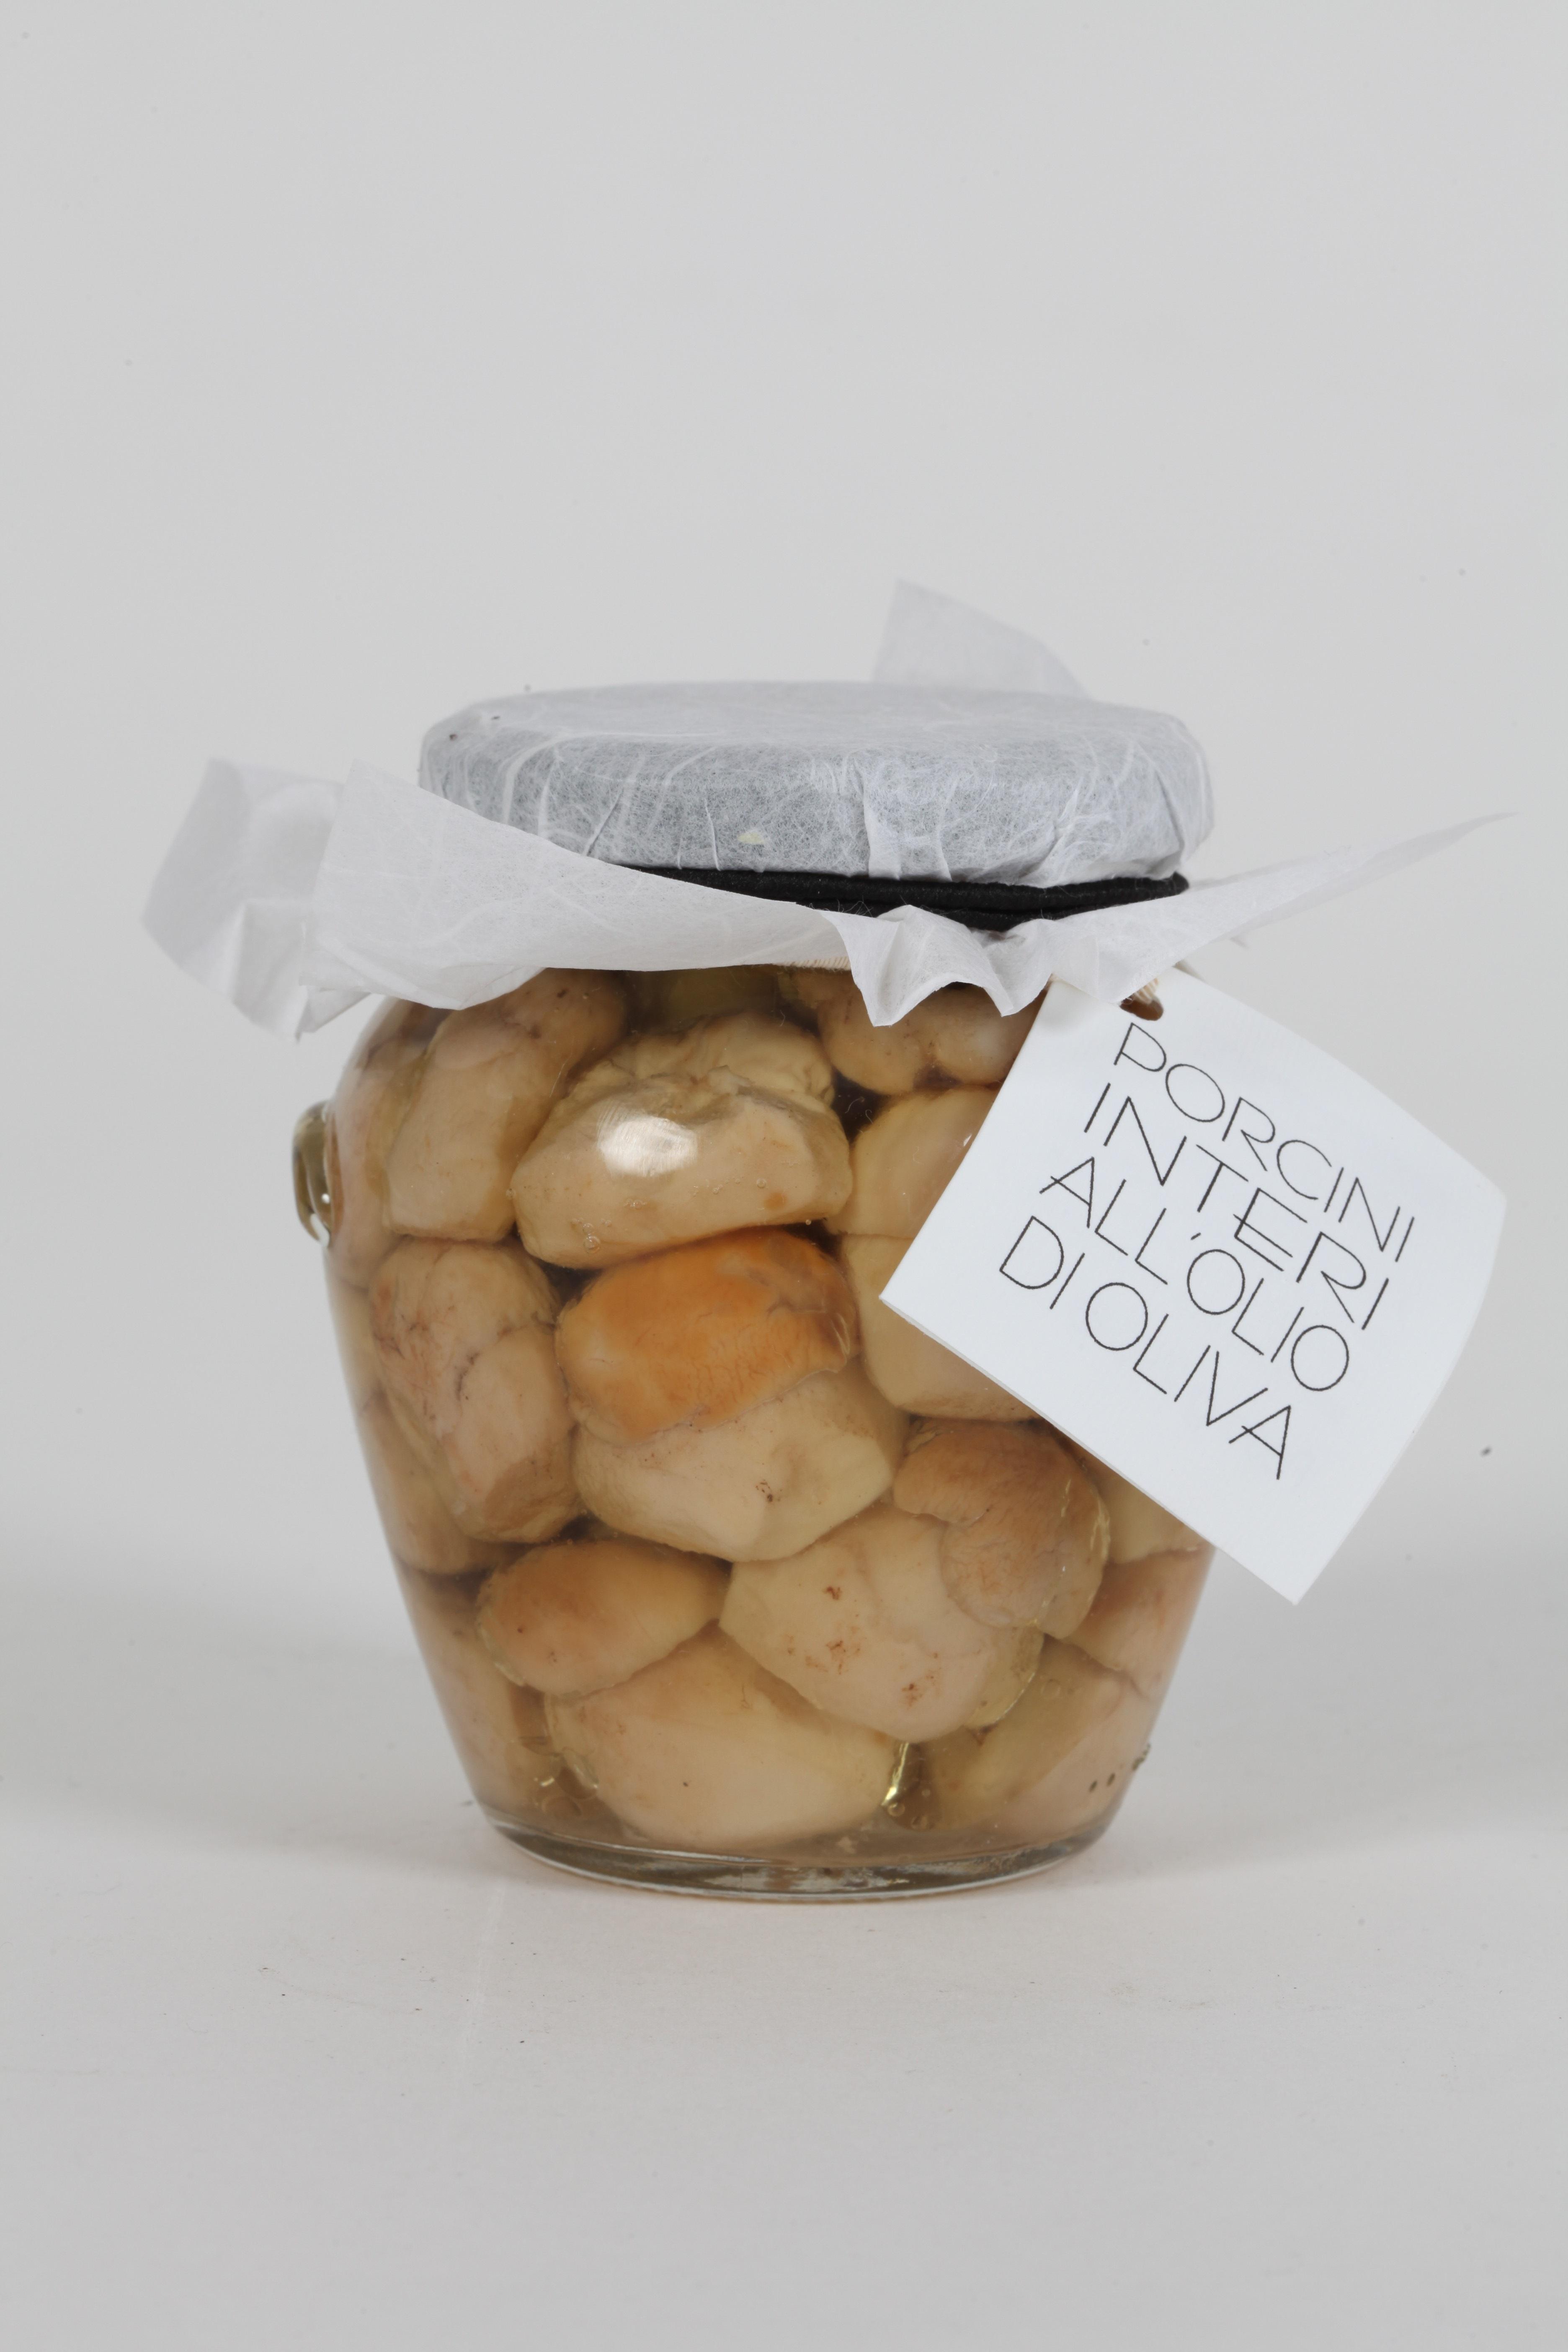 CANTALUPPI - Funghi Porcini Interi All'olio d'oliva Gr. 290